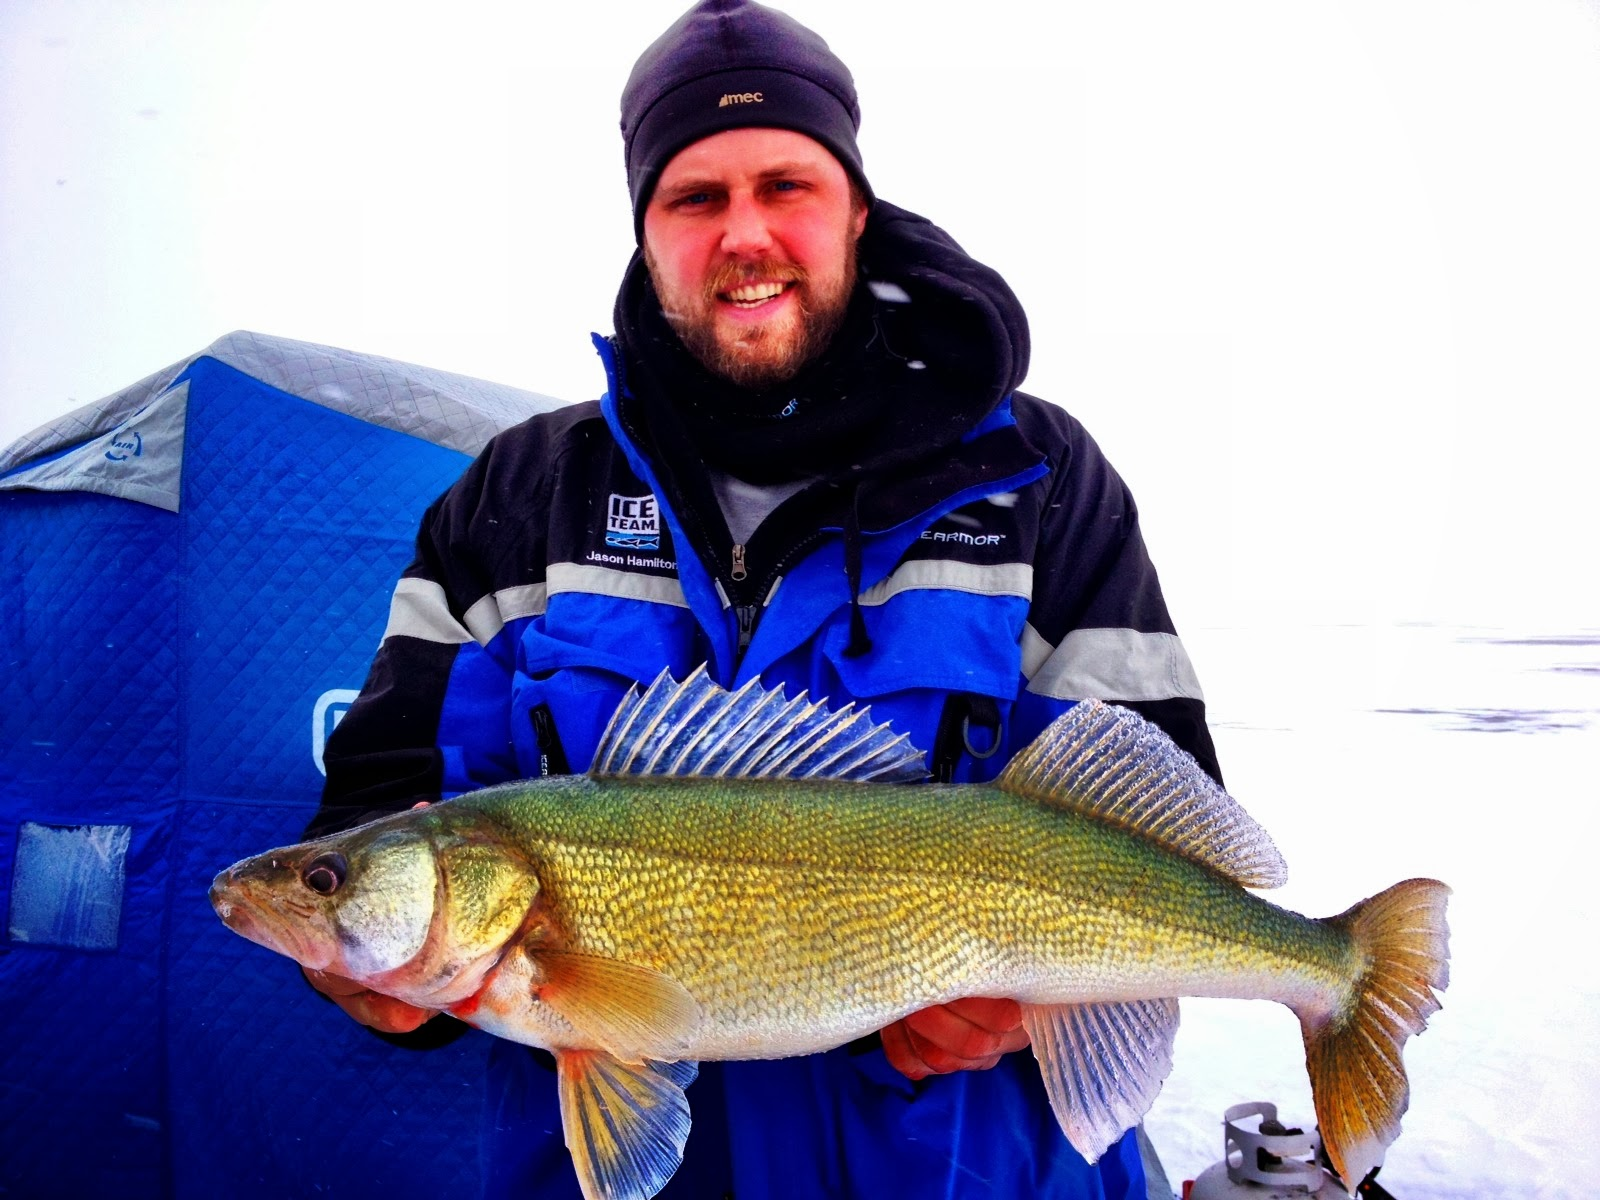 Jason hamilton outdoors icefishing lake winnipeg dec 16 for Lake winnipeg ice fishing